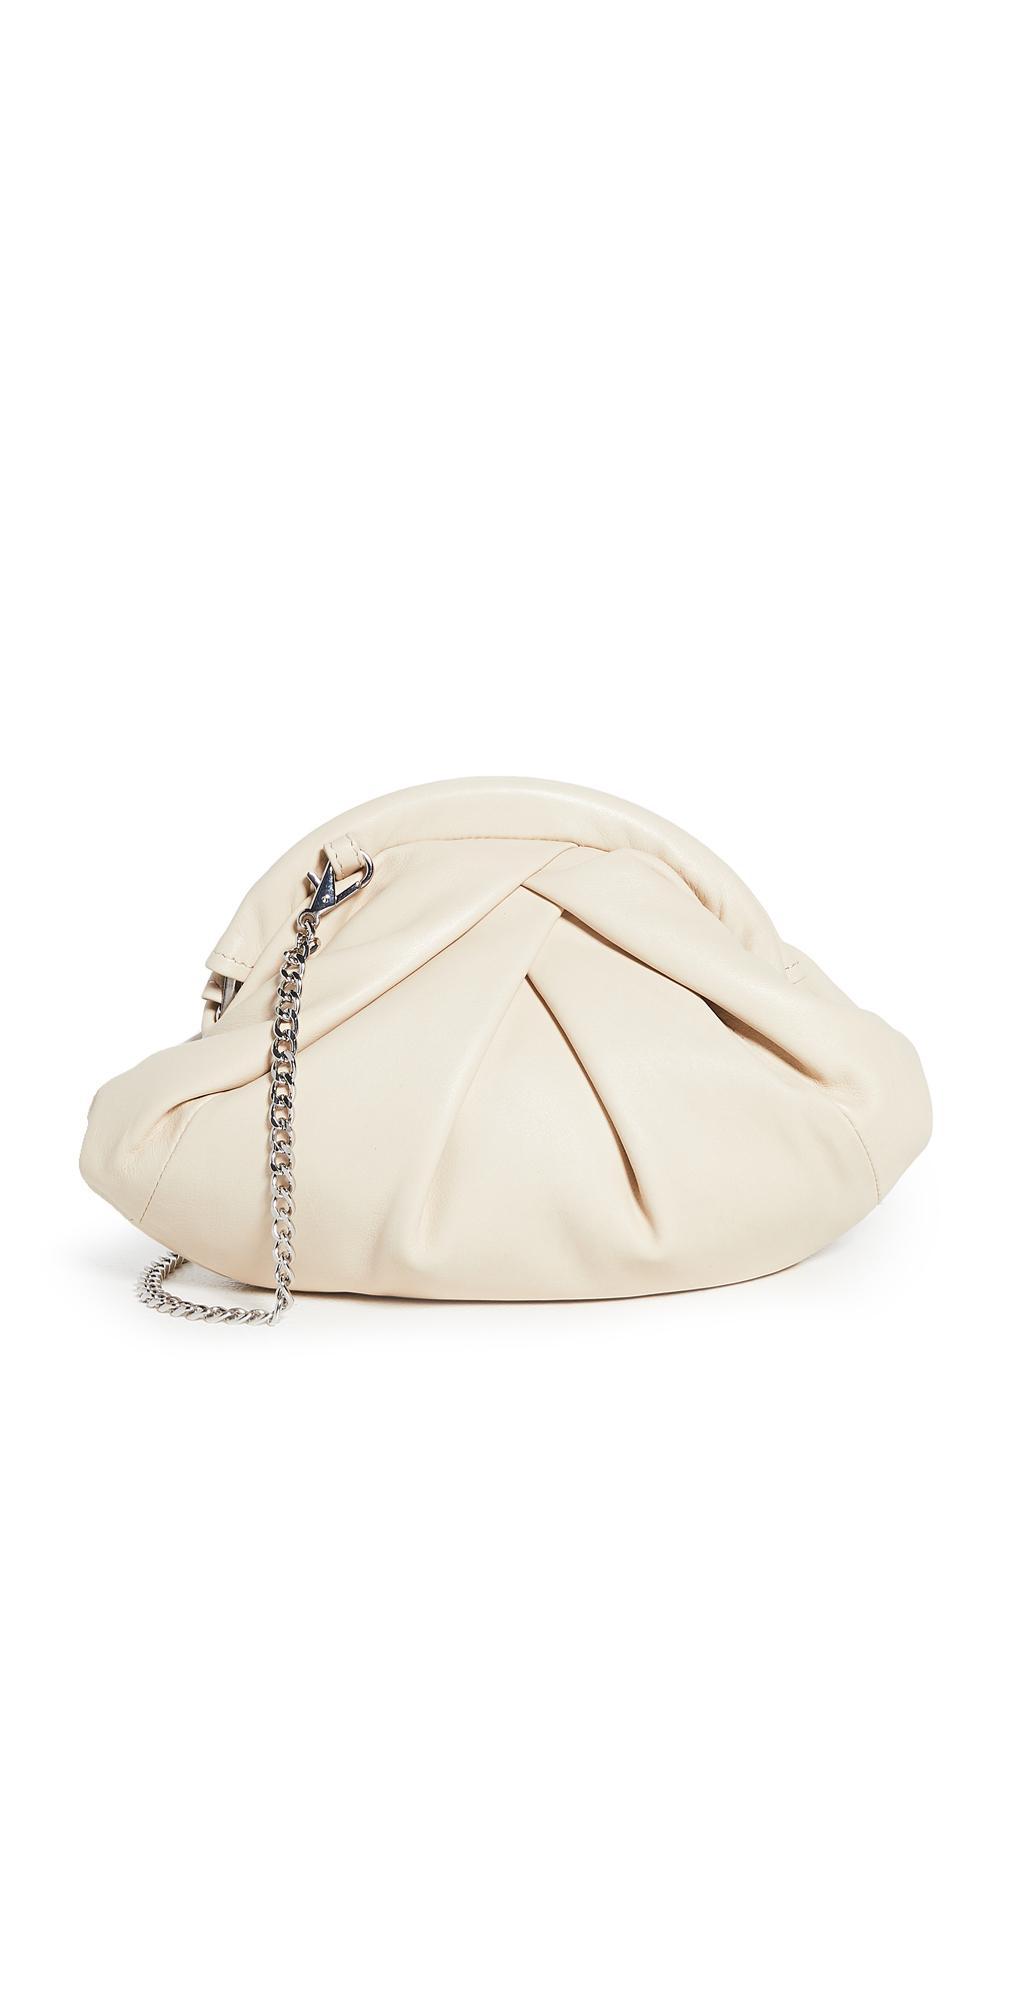 Nunoo Mini Saki Bag